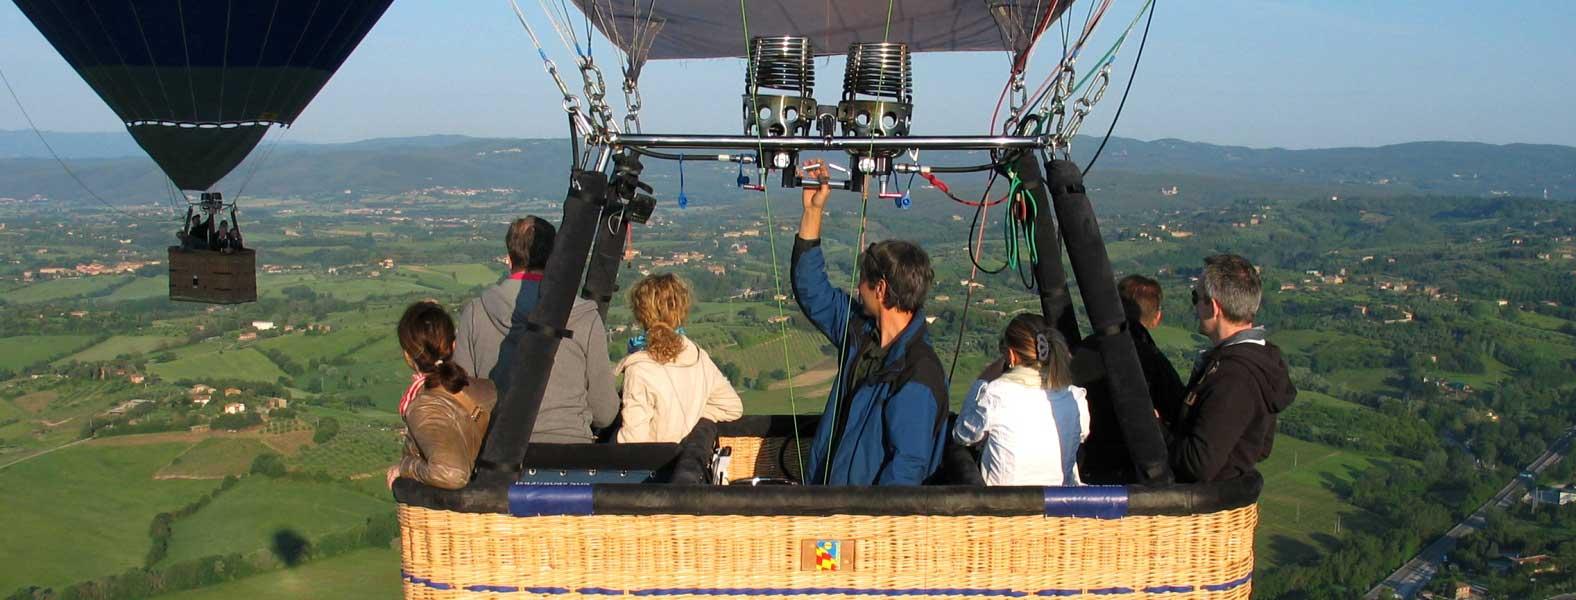 in-flight-siena-taverne-d'arbia